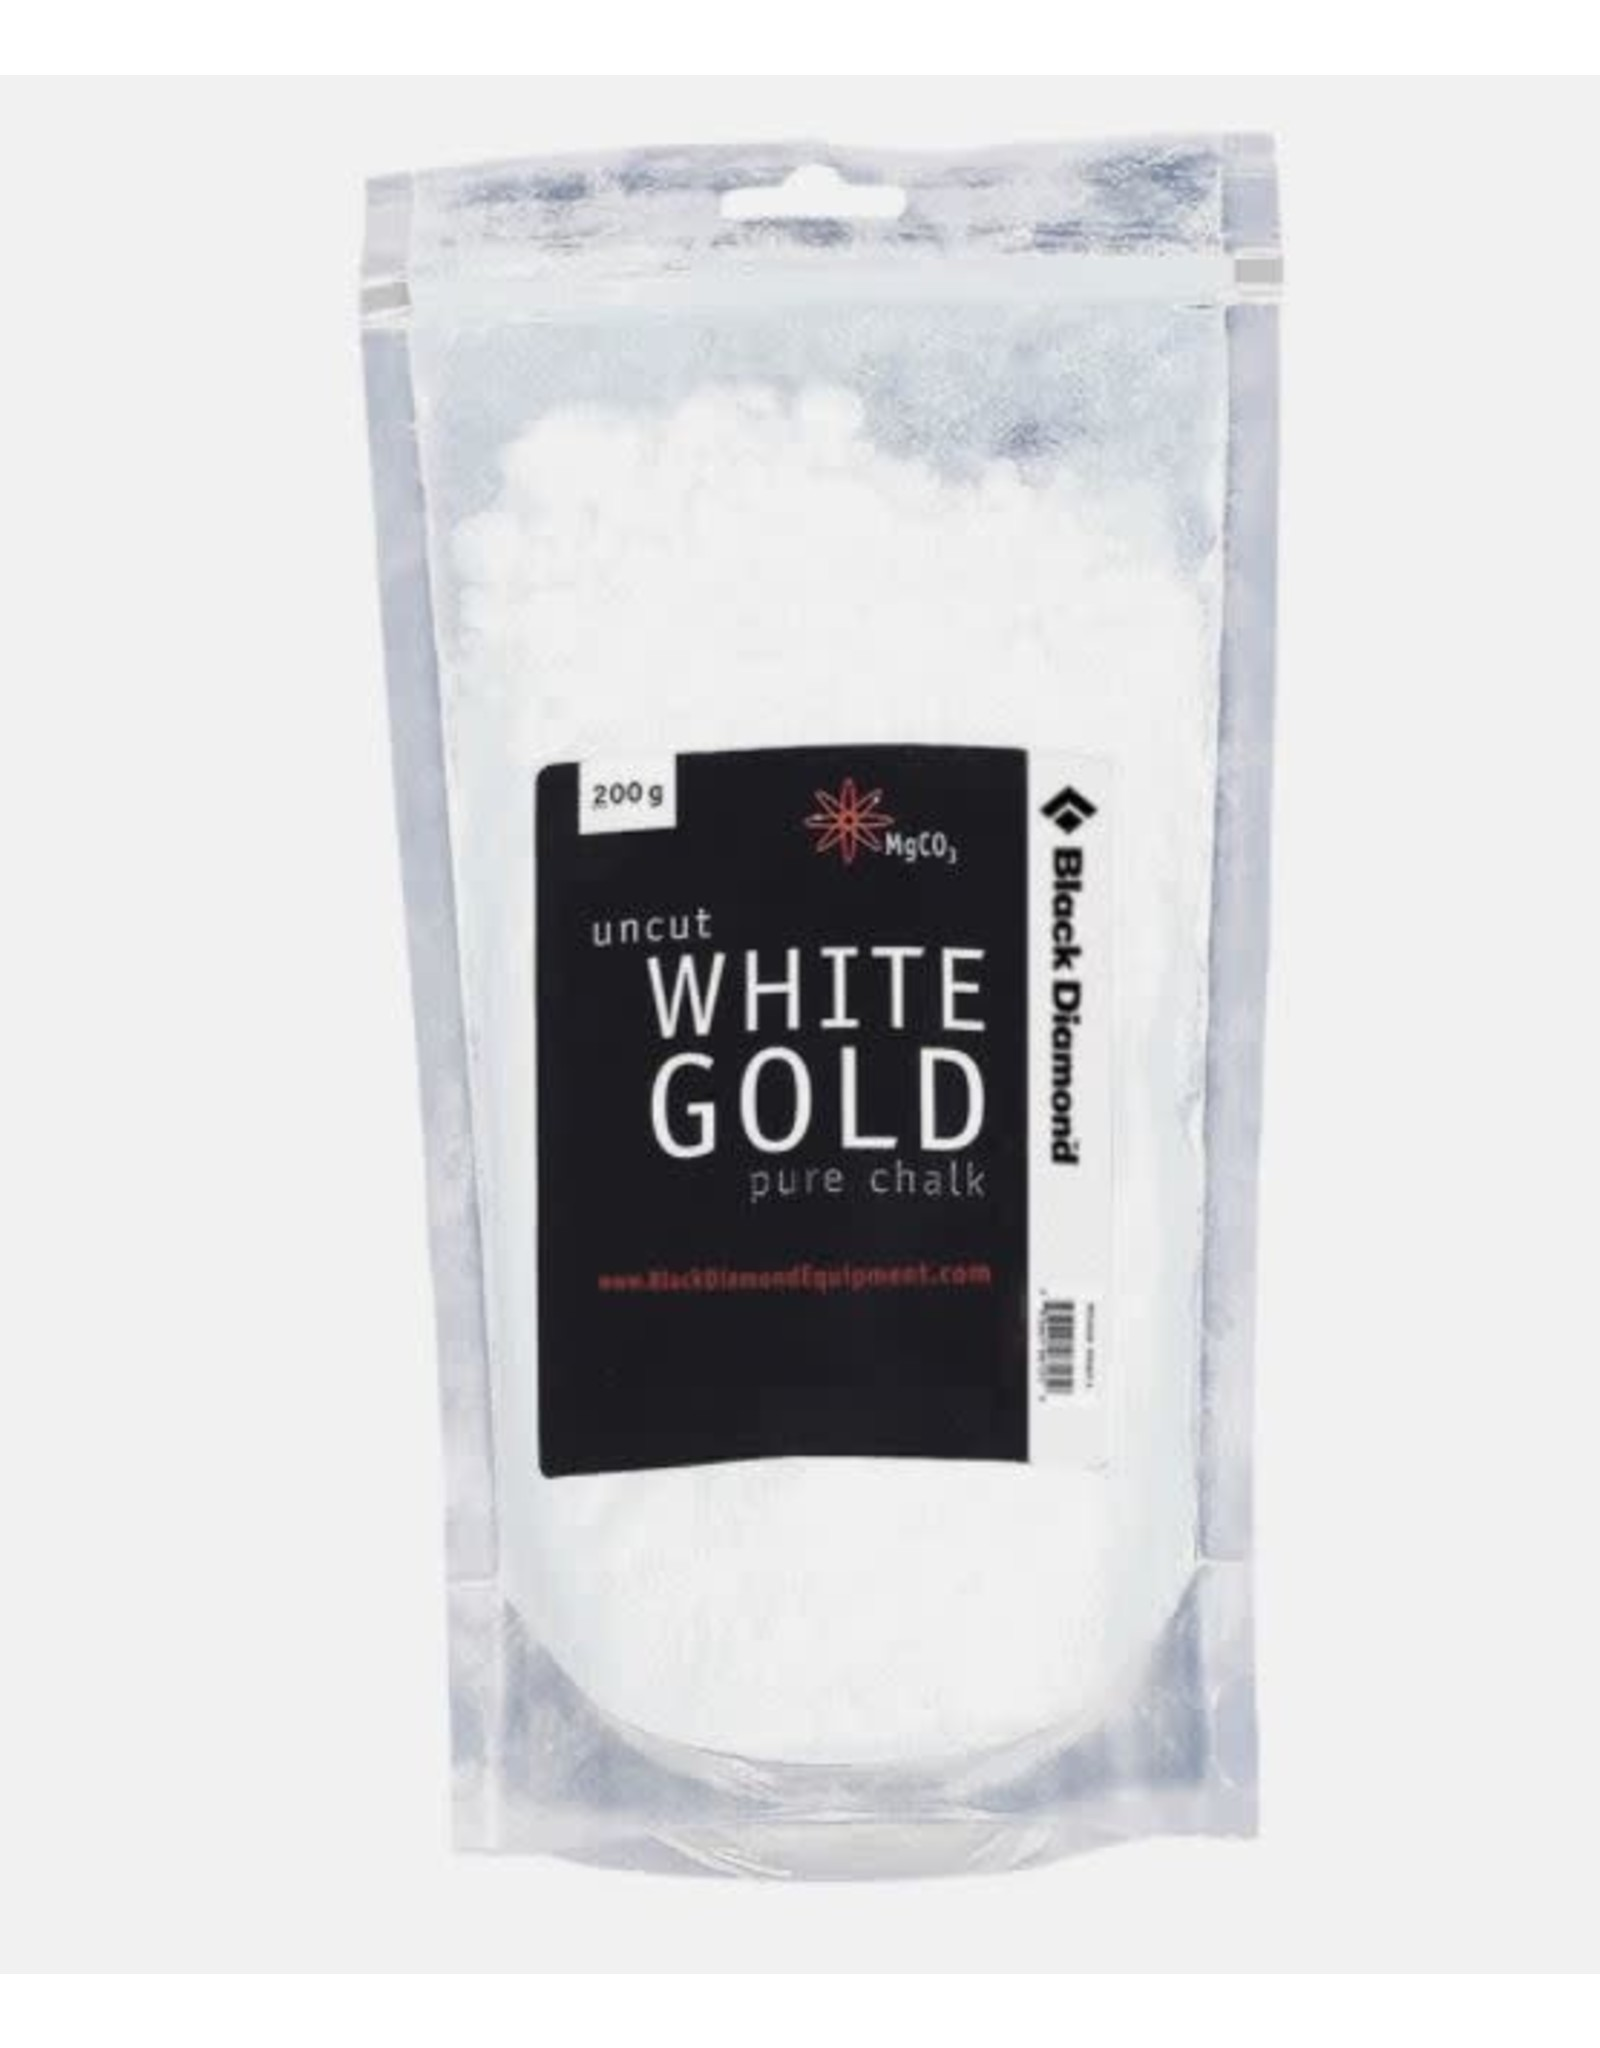 BLACK DIAMOND BLACK DIAMOND LOOSE WHITE GOLD CHALK 200g #BD5505030000ALL1